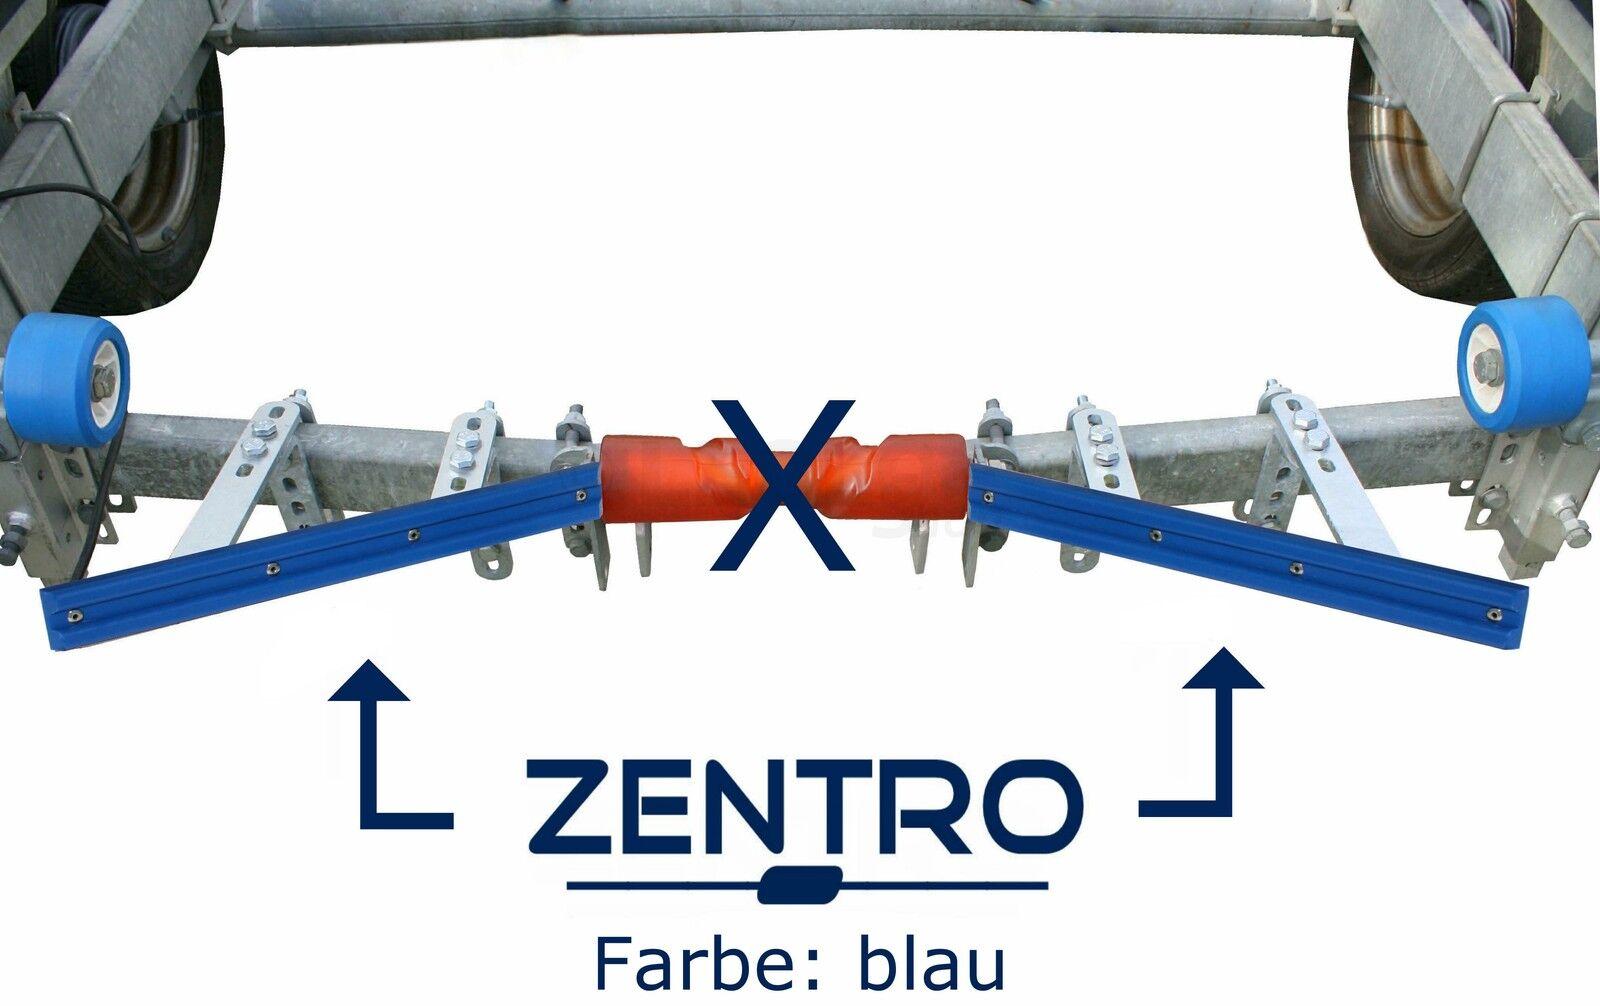 ⚓ Zentrierhilfe Zentriervorrichtung ZENTRO Trailer - blau/rot | Sliphilfe Trailer ZENTRO 73e742